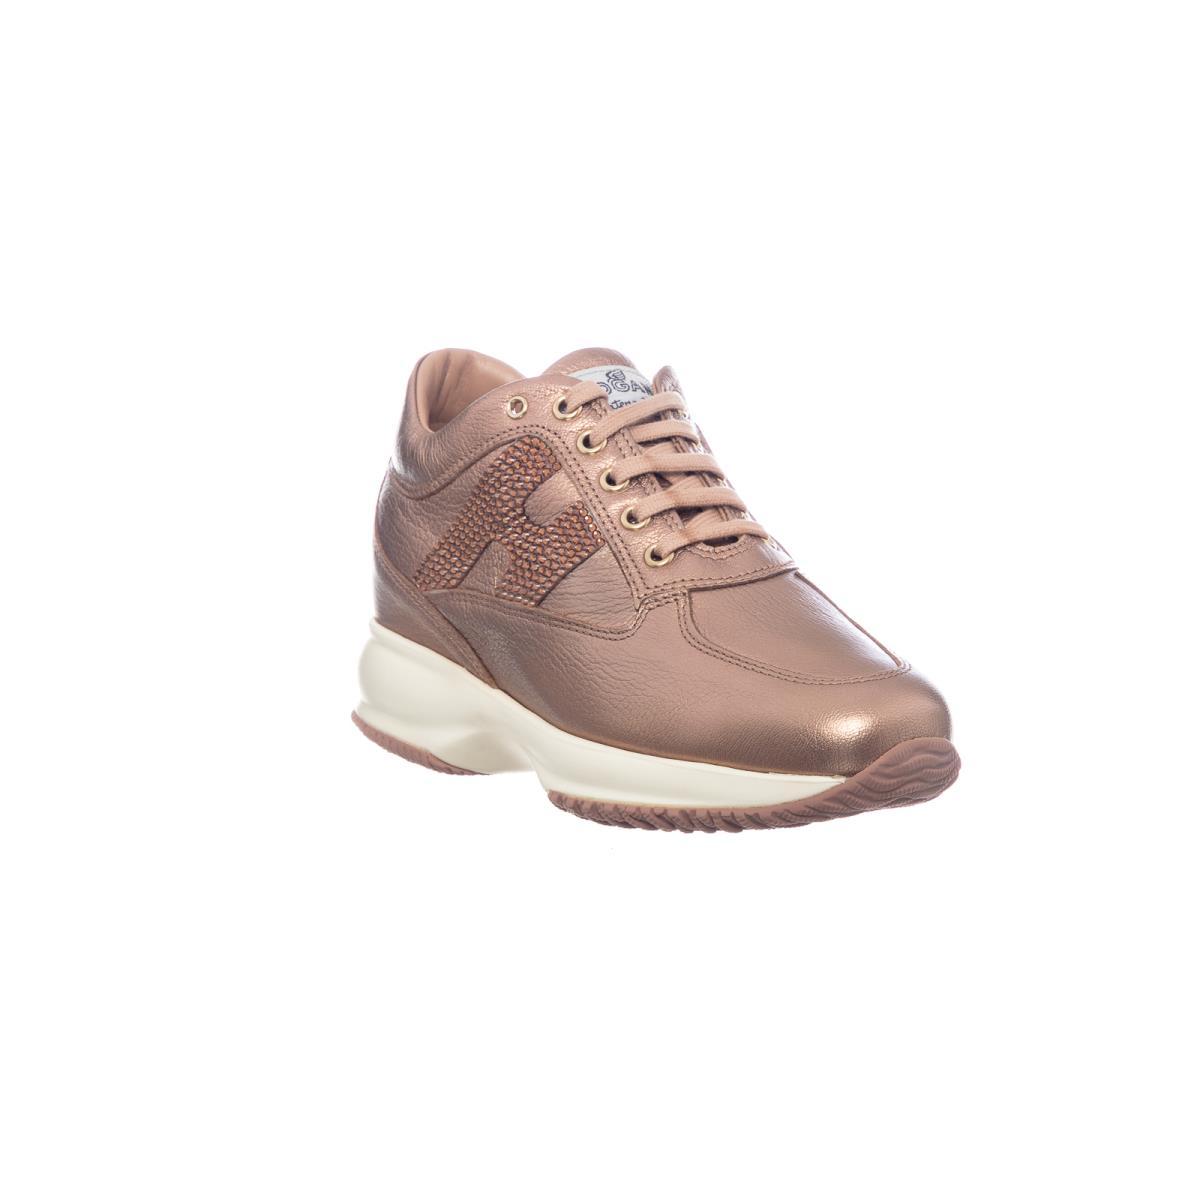 Sneakers Interactive H Con Strass Da Donna Hxw00n02010o6v Hogan